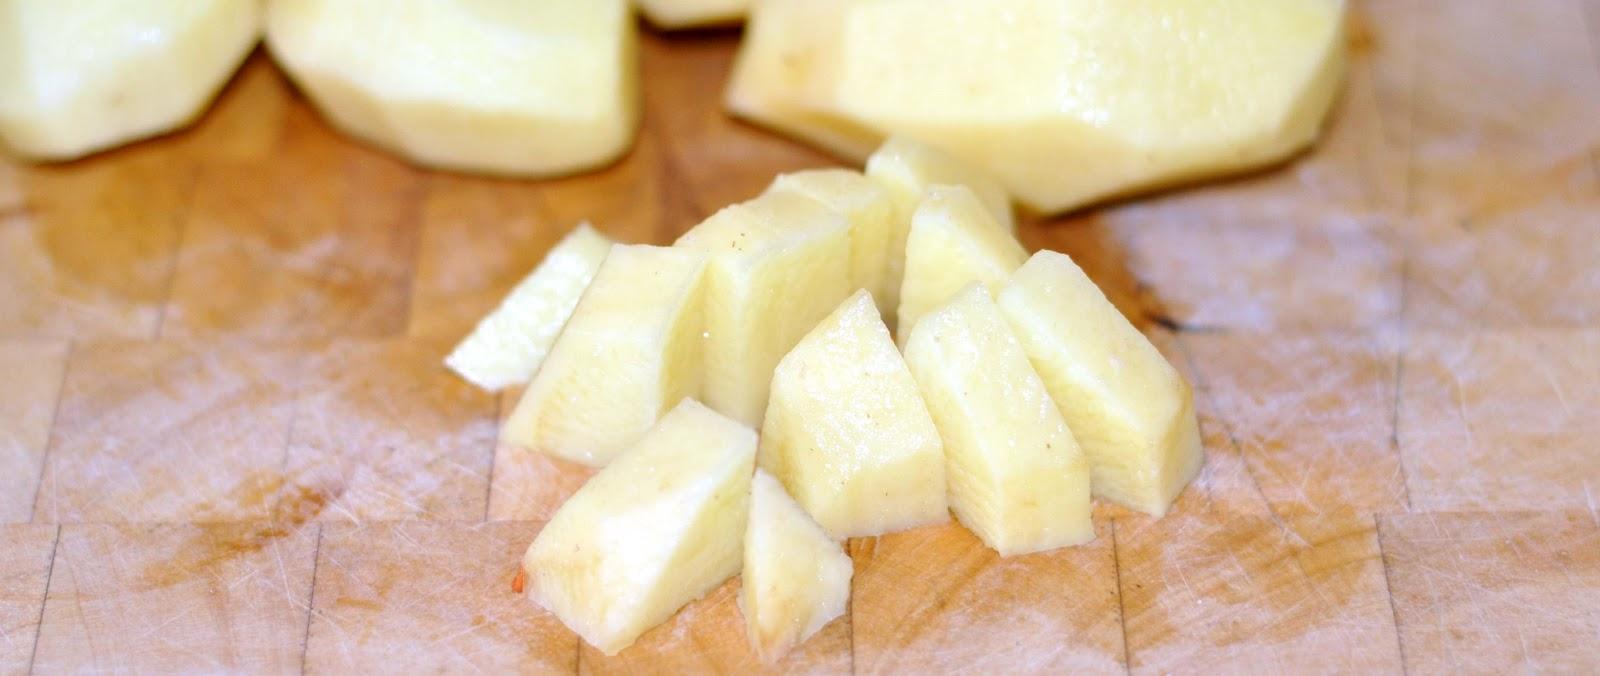 how to get rid of onion taste on nipples